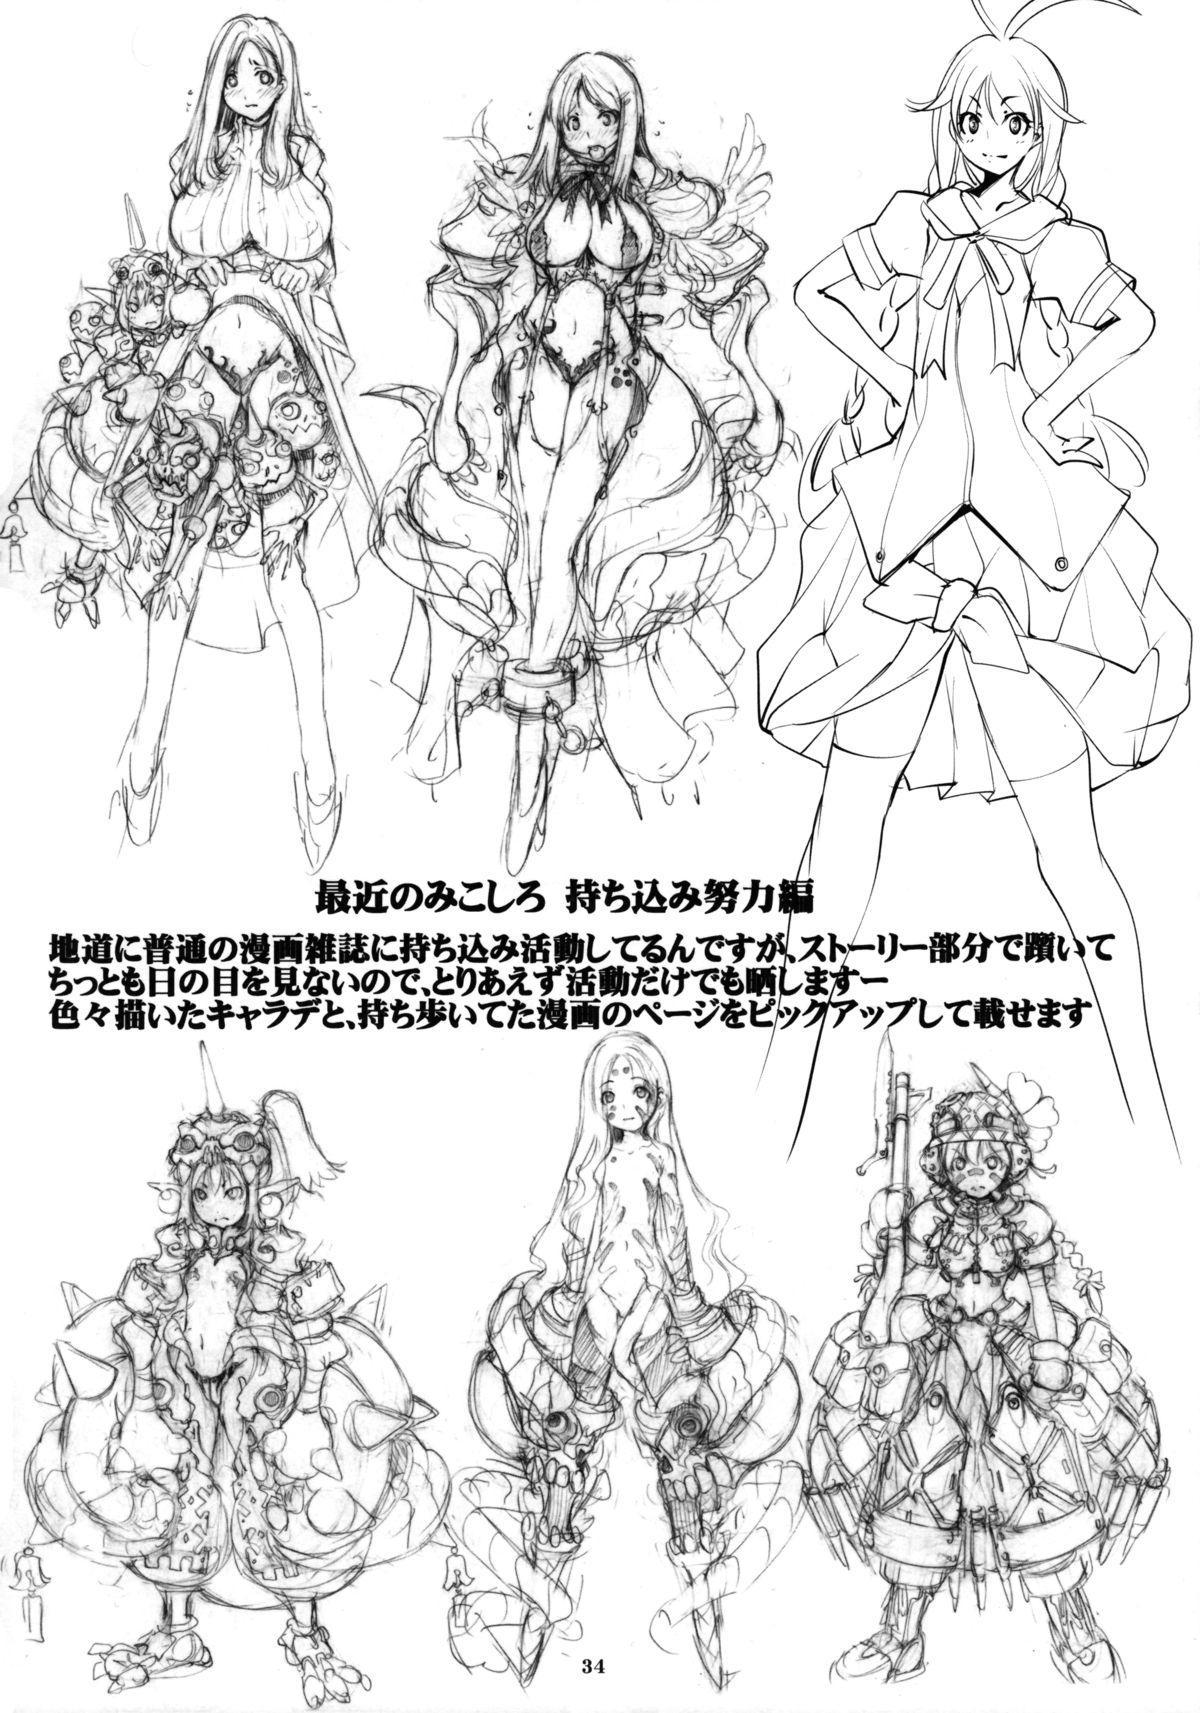 (C89) [Algolagnia (Mikoshiro Honnin)] Naruto [saga] sei (NARUTO) 33